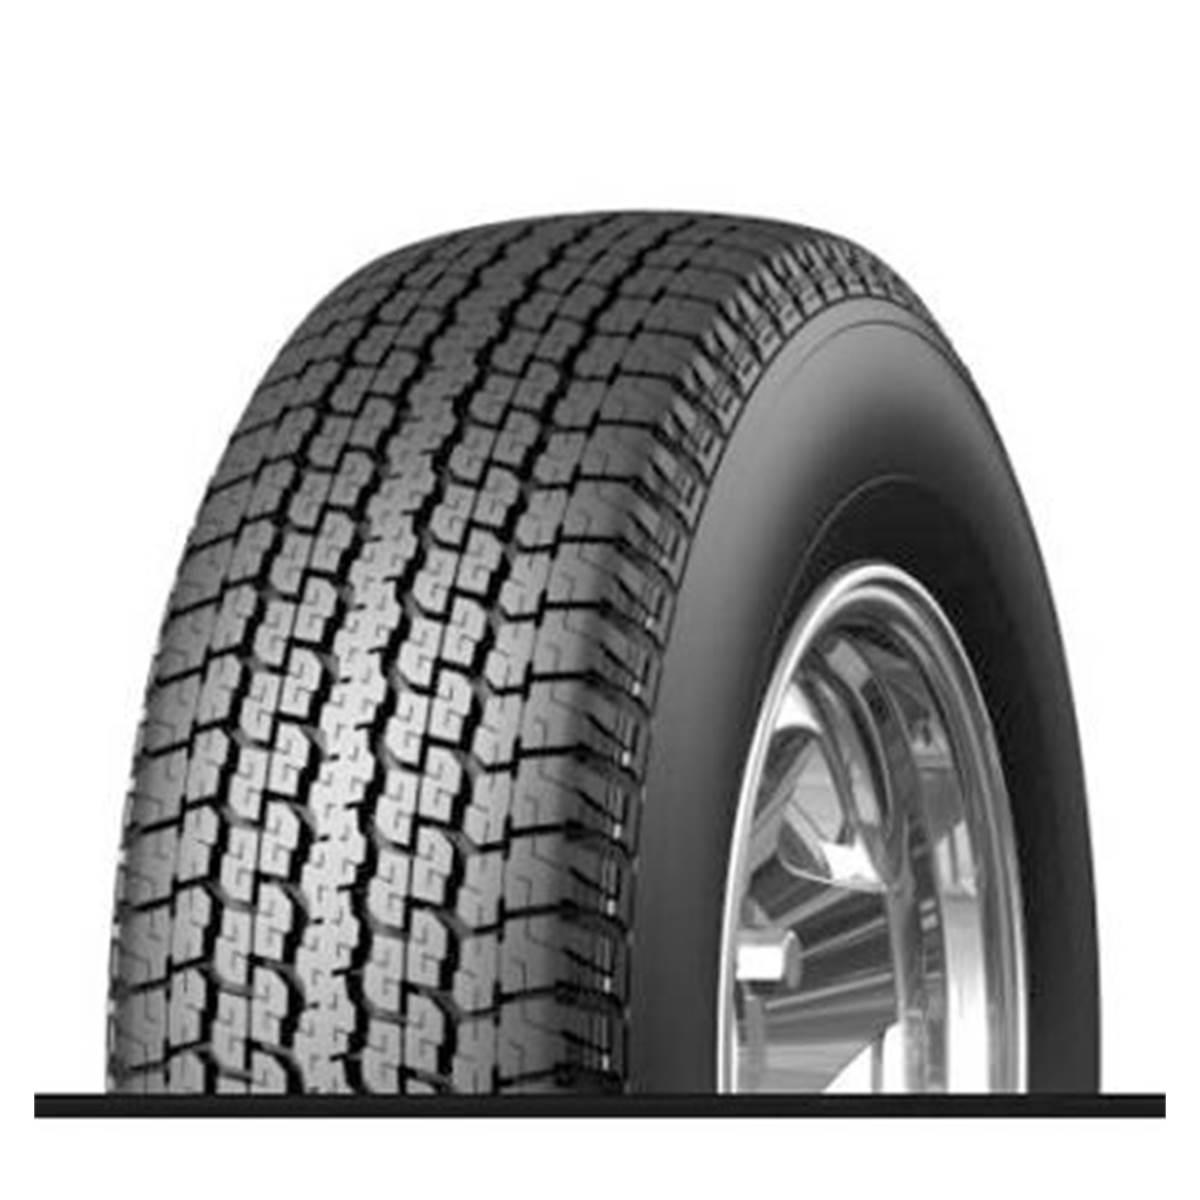 Pneu Bridgestone 275/65X17 115 T DUELER D840